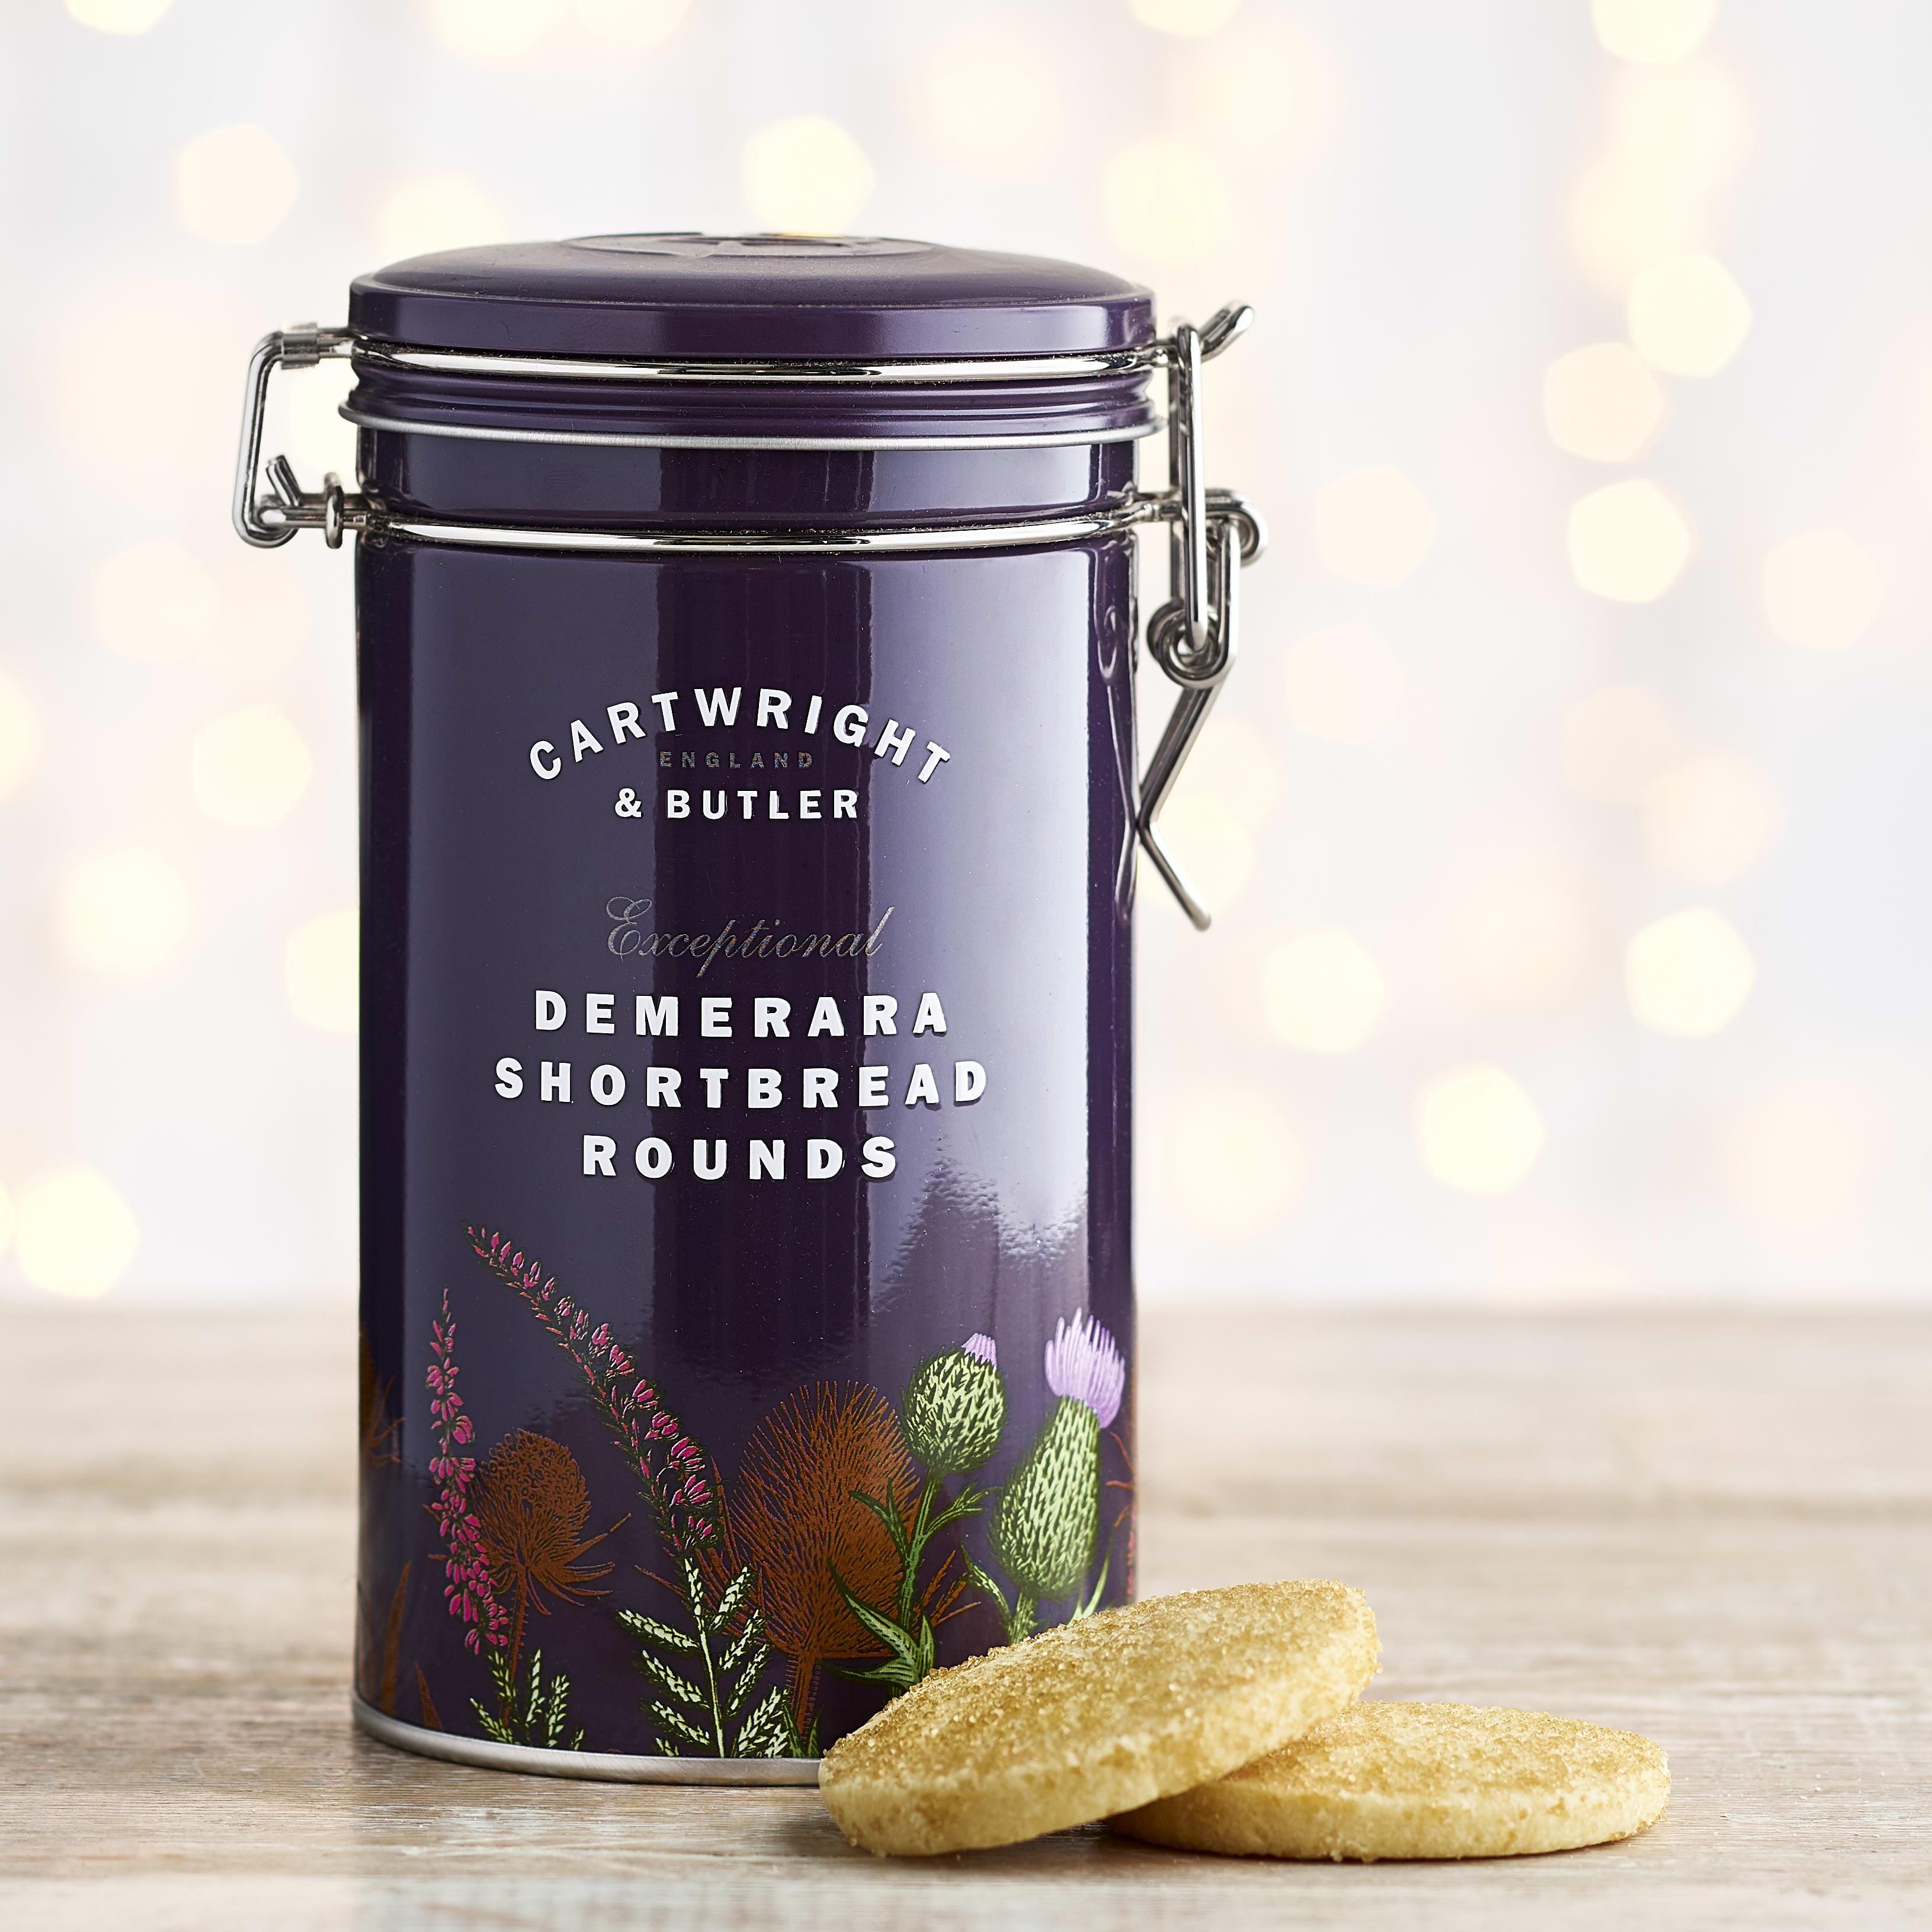 Cartwright & Butler Demerara Shortbread Rounds in Gift Tin, 200g